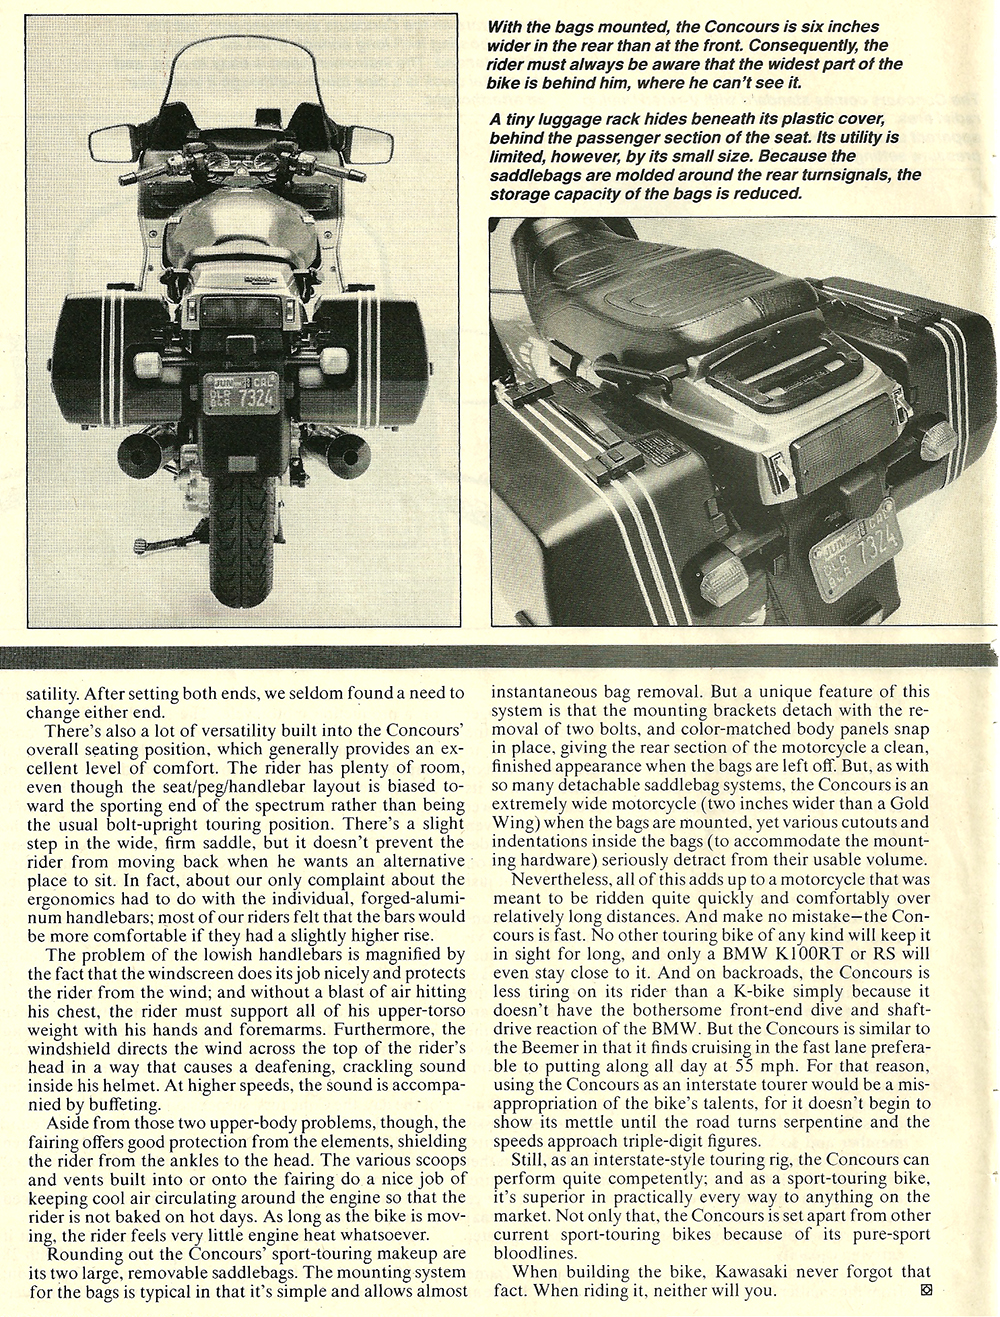 1986 Kawasaki 1000 Concours road test 05.jpg